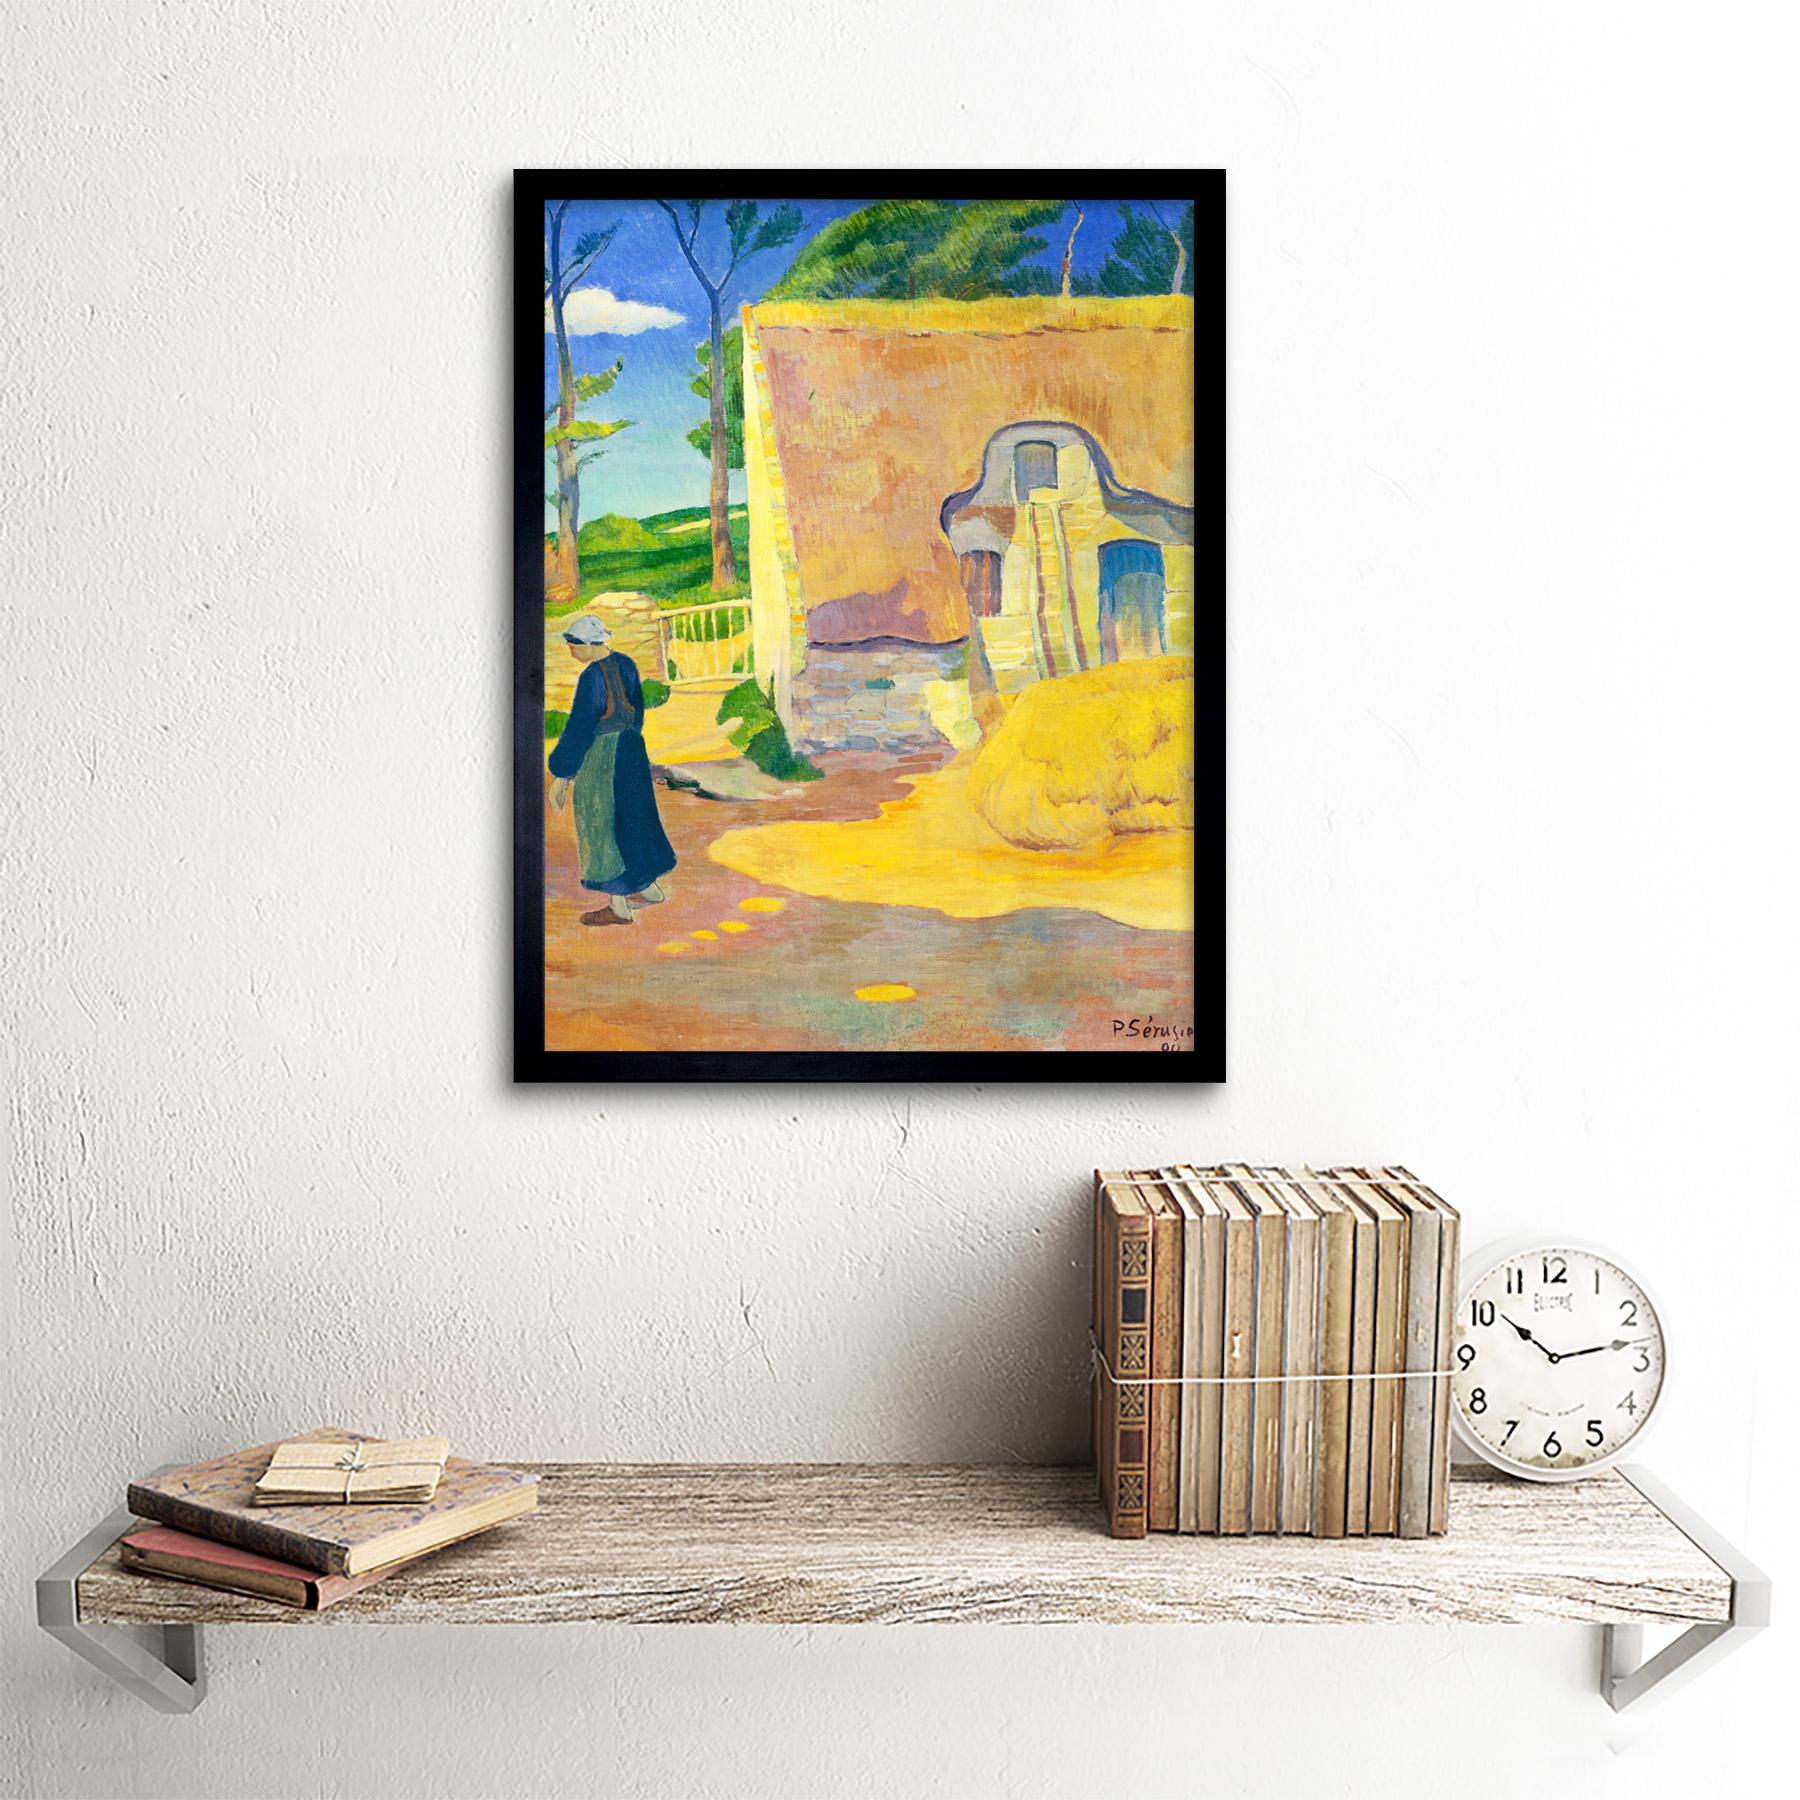 Serusier-Farmhouse-Le-Pouldu-Painting-Art-Print-Framed-12x16 thumbnail 3